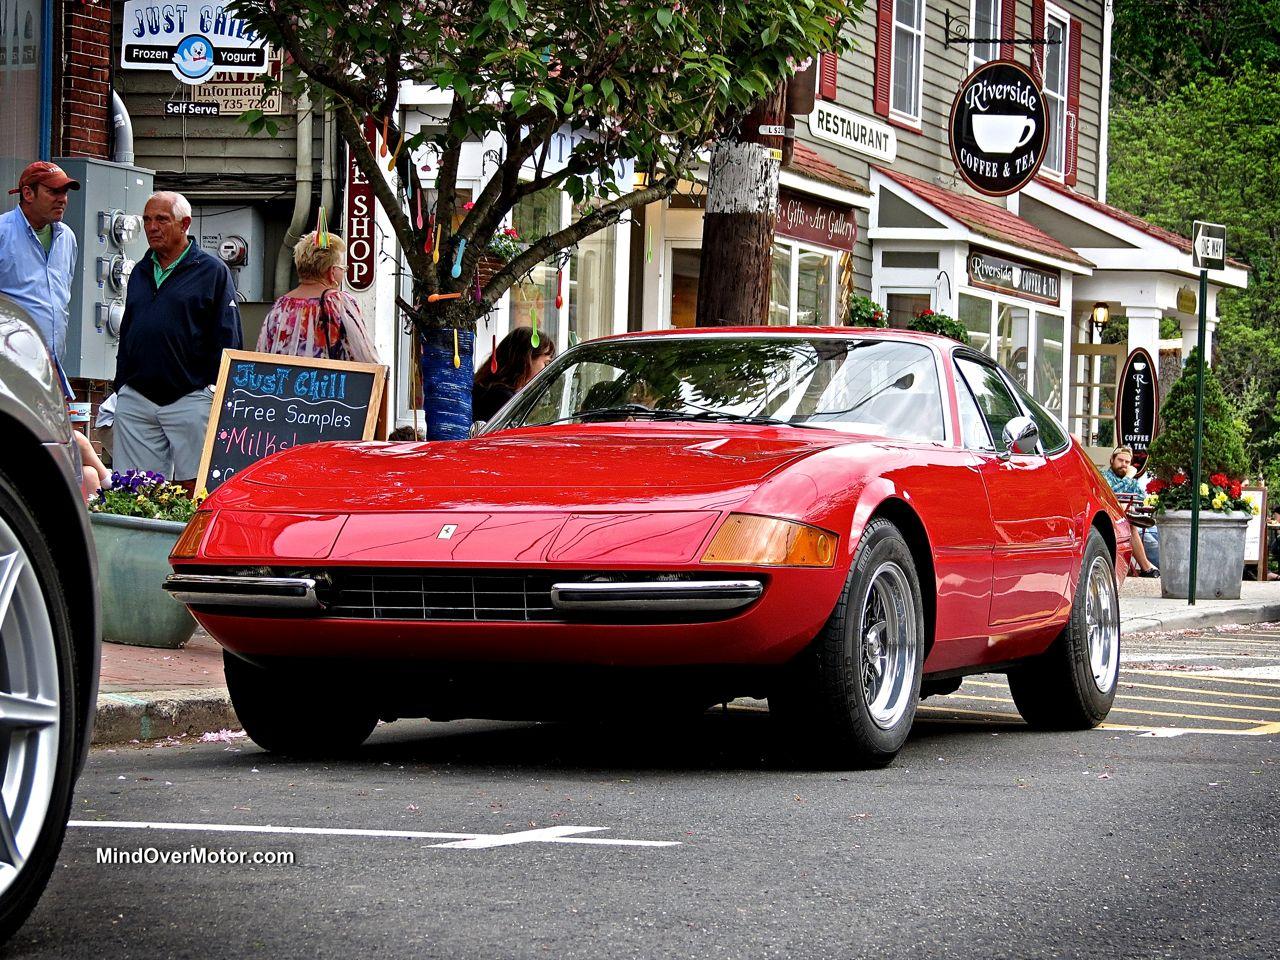 Ferrari 365 GTB/4 Daytona in Clinton NJ